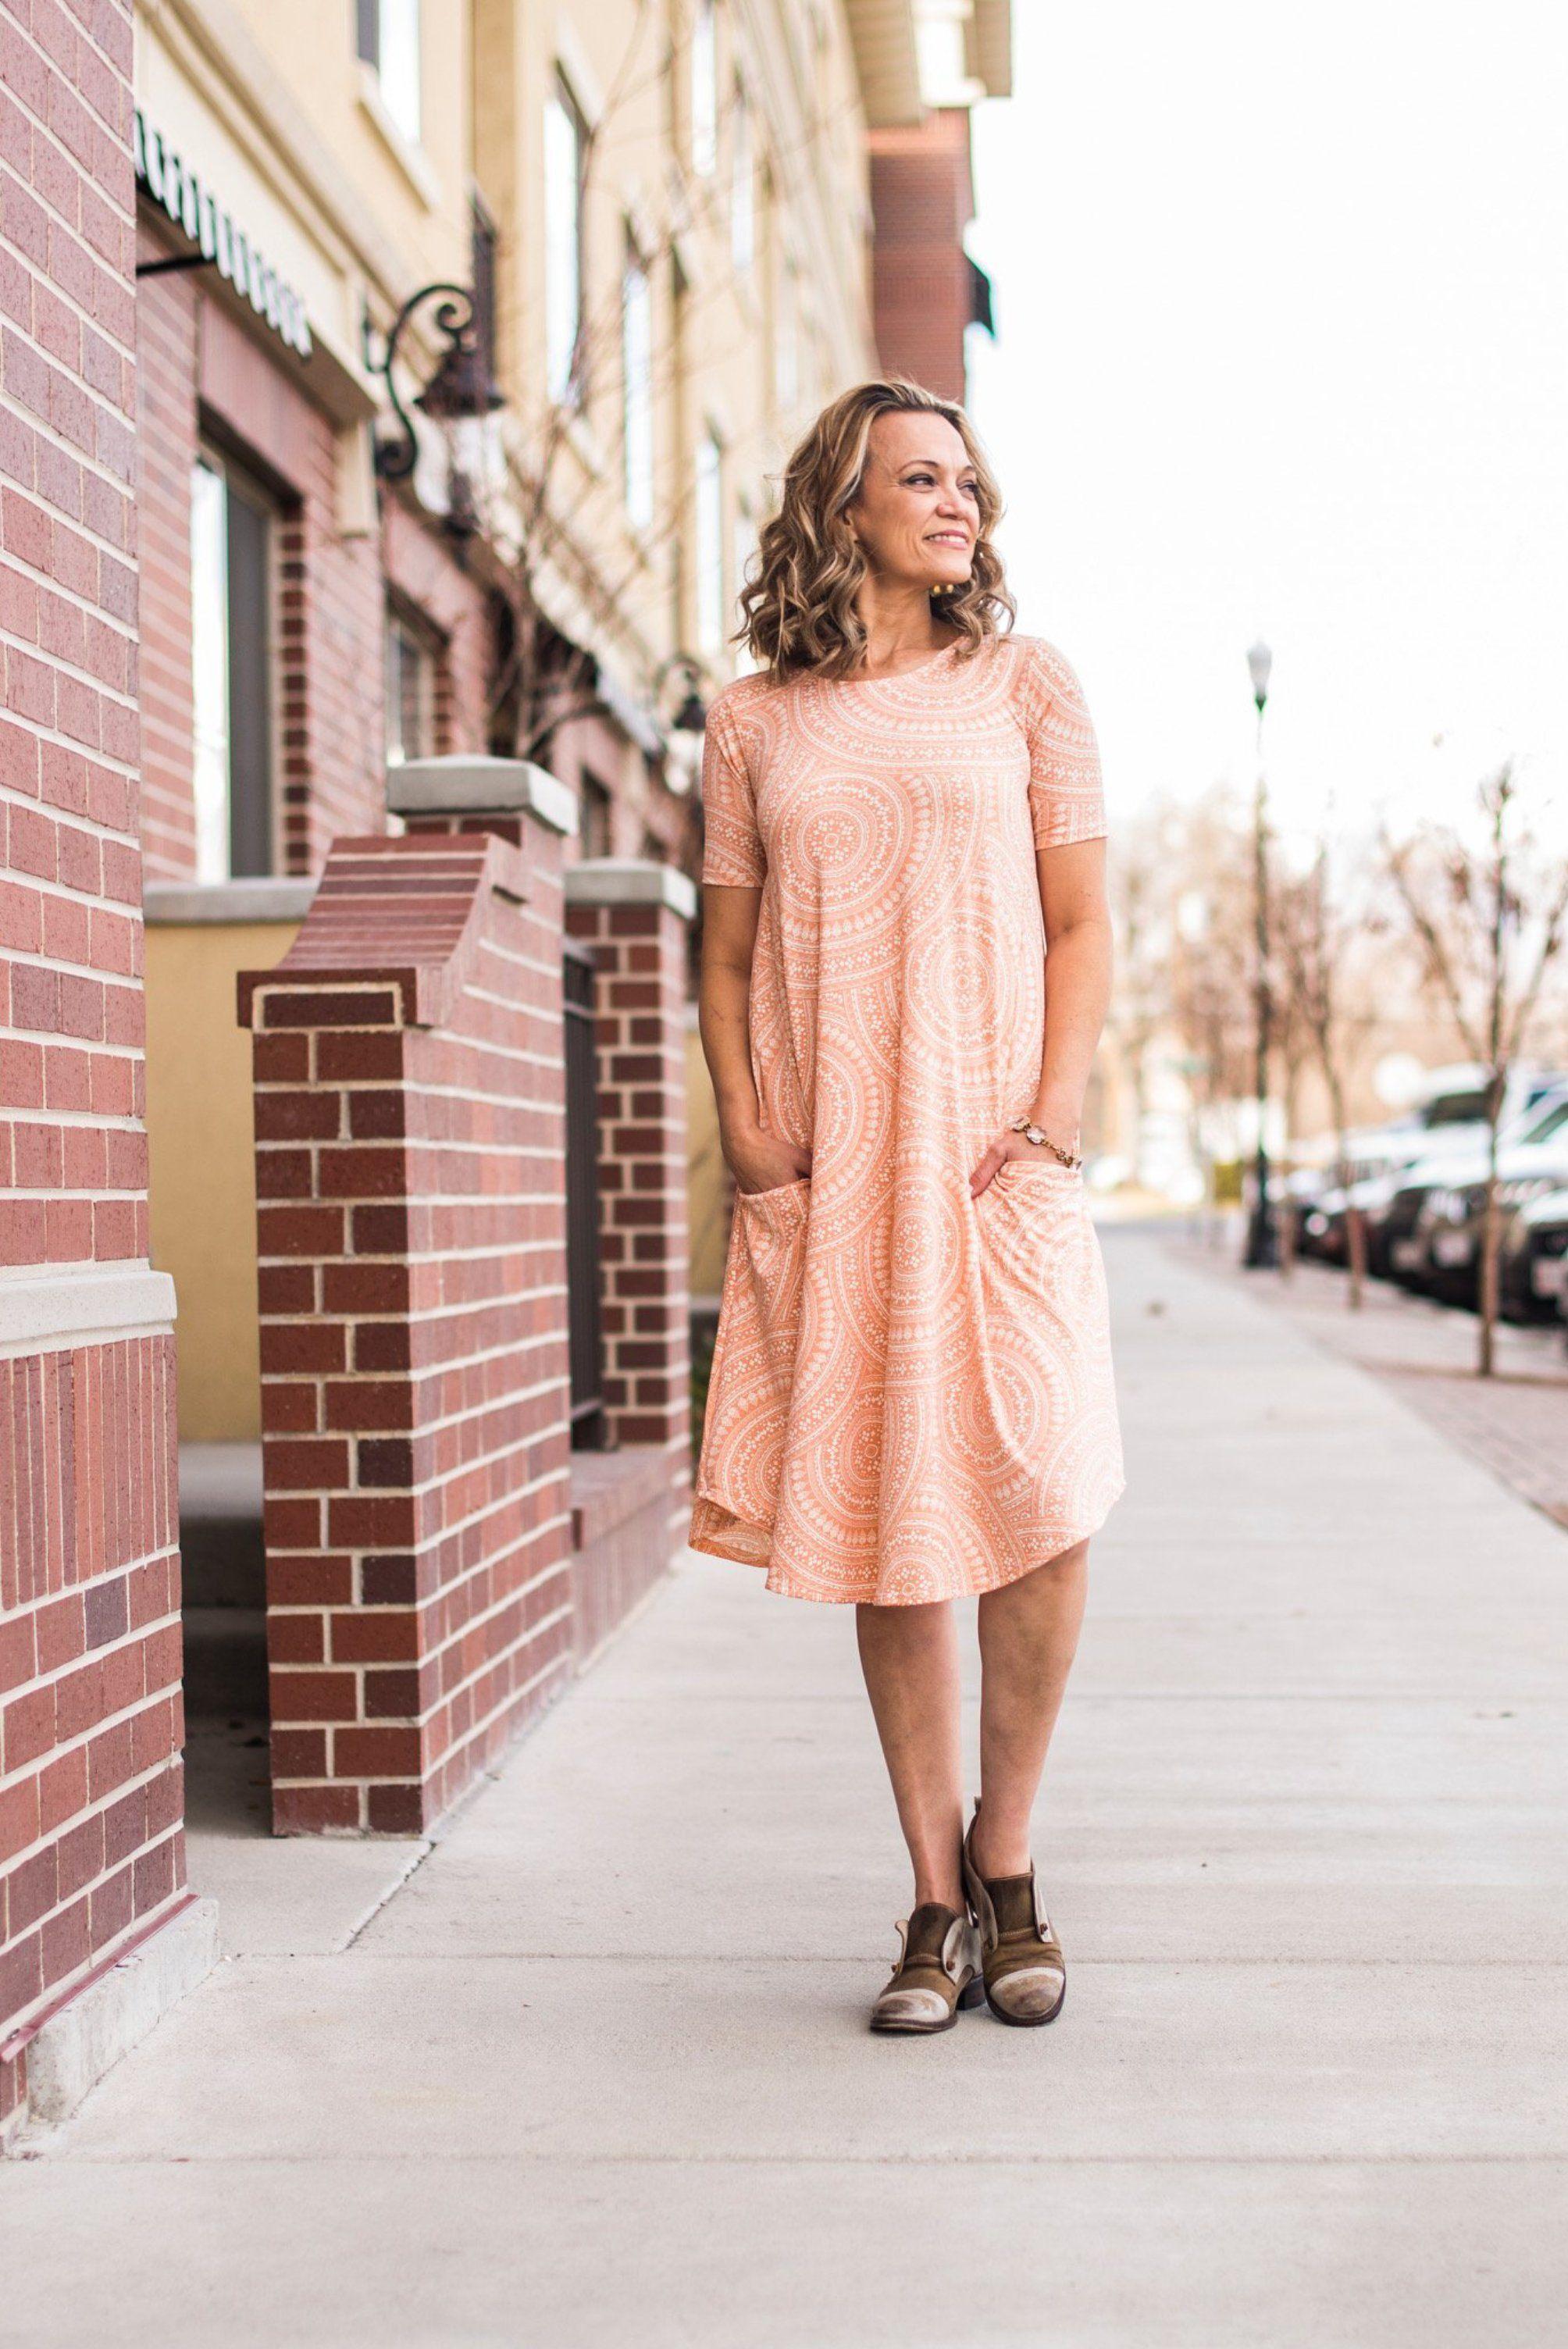 050b3f42e873 Peach Circles April Dress | Denim & Navy Fashion | Modest Clothing for  Teens &